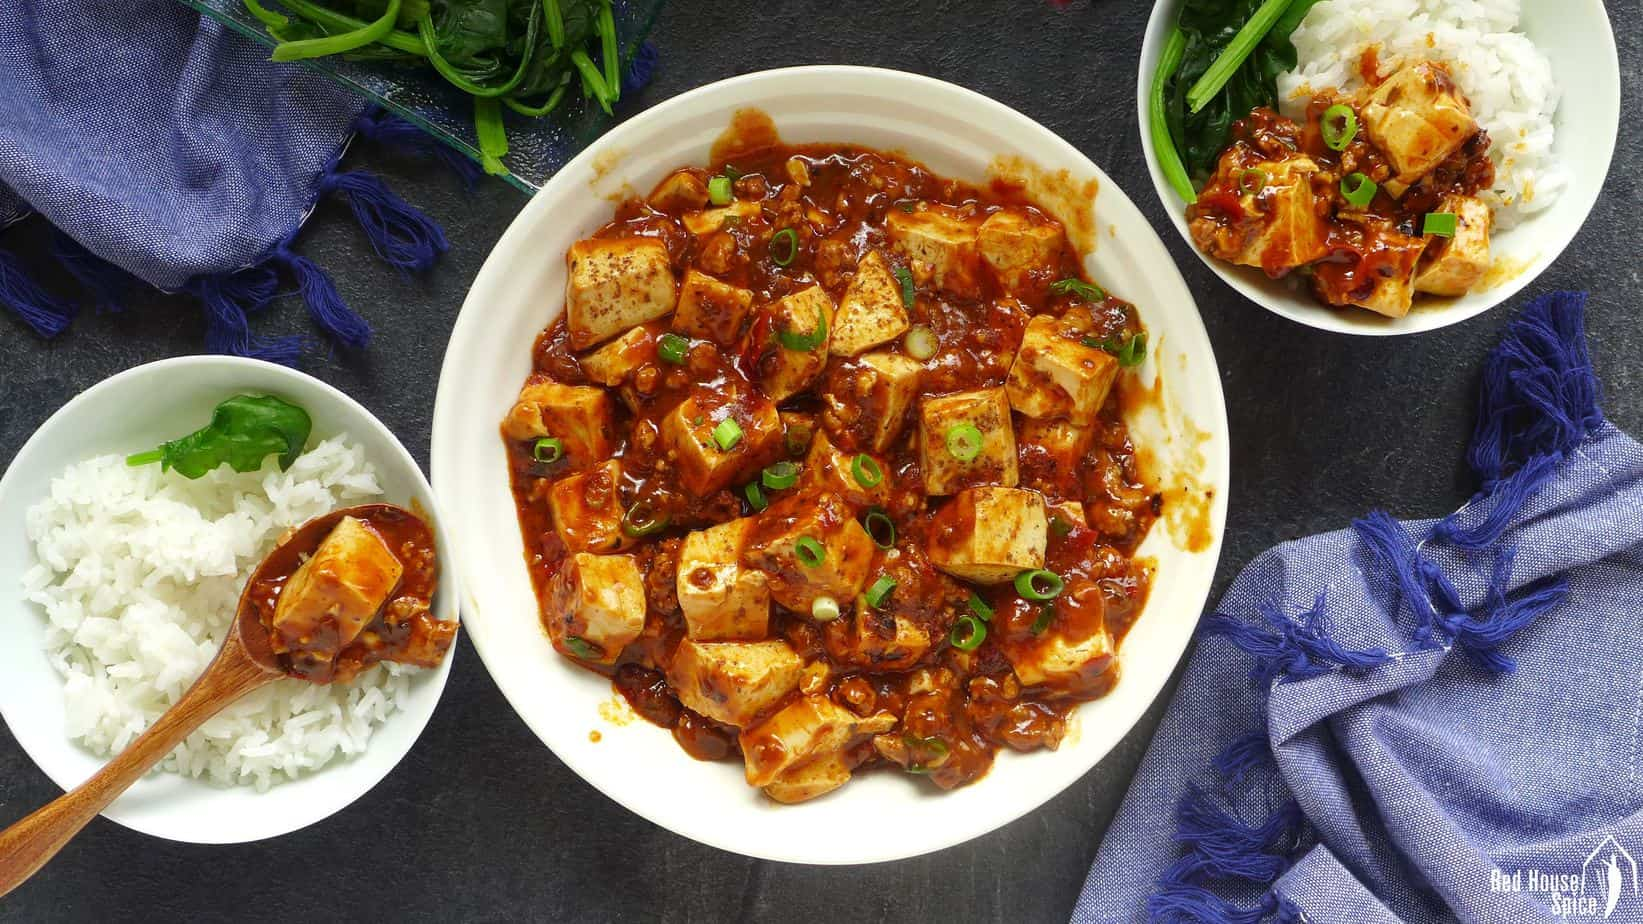 Mapo tofu, the authentic way (麻婆豆腐)